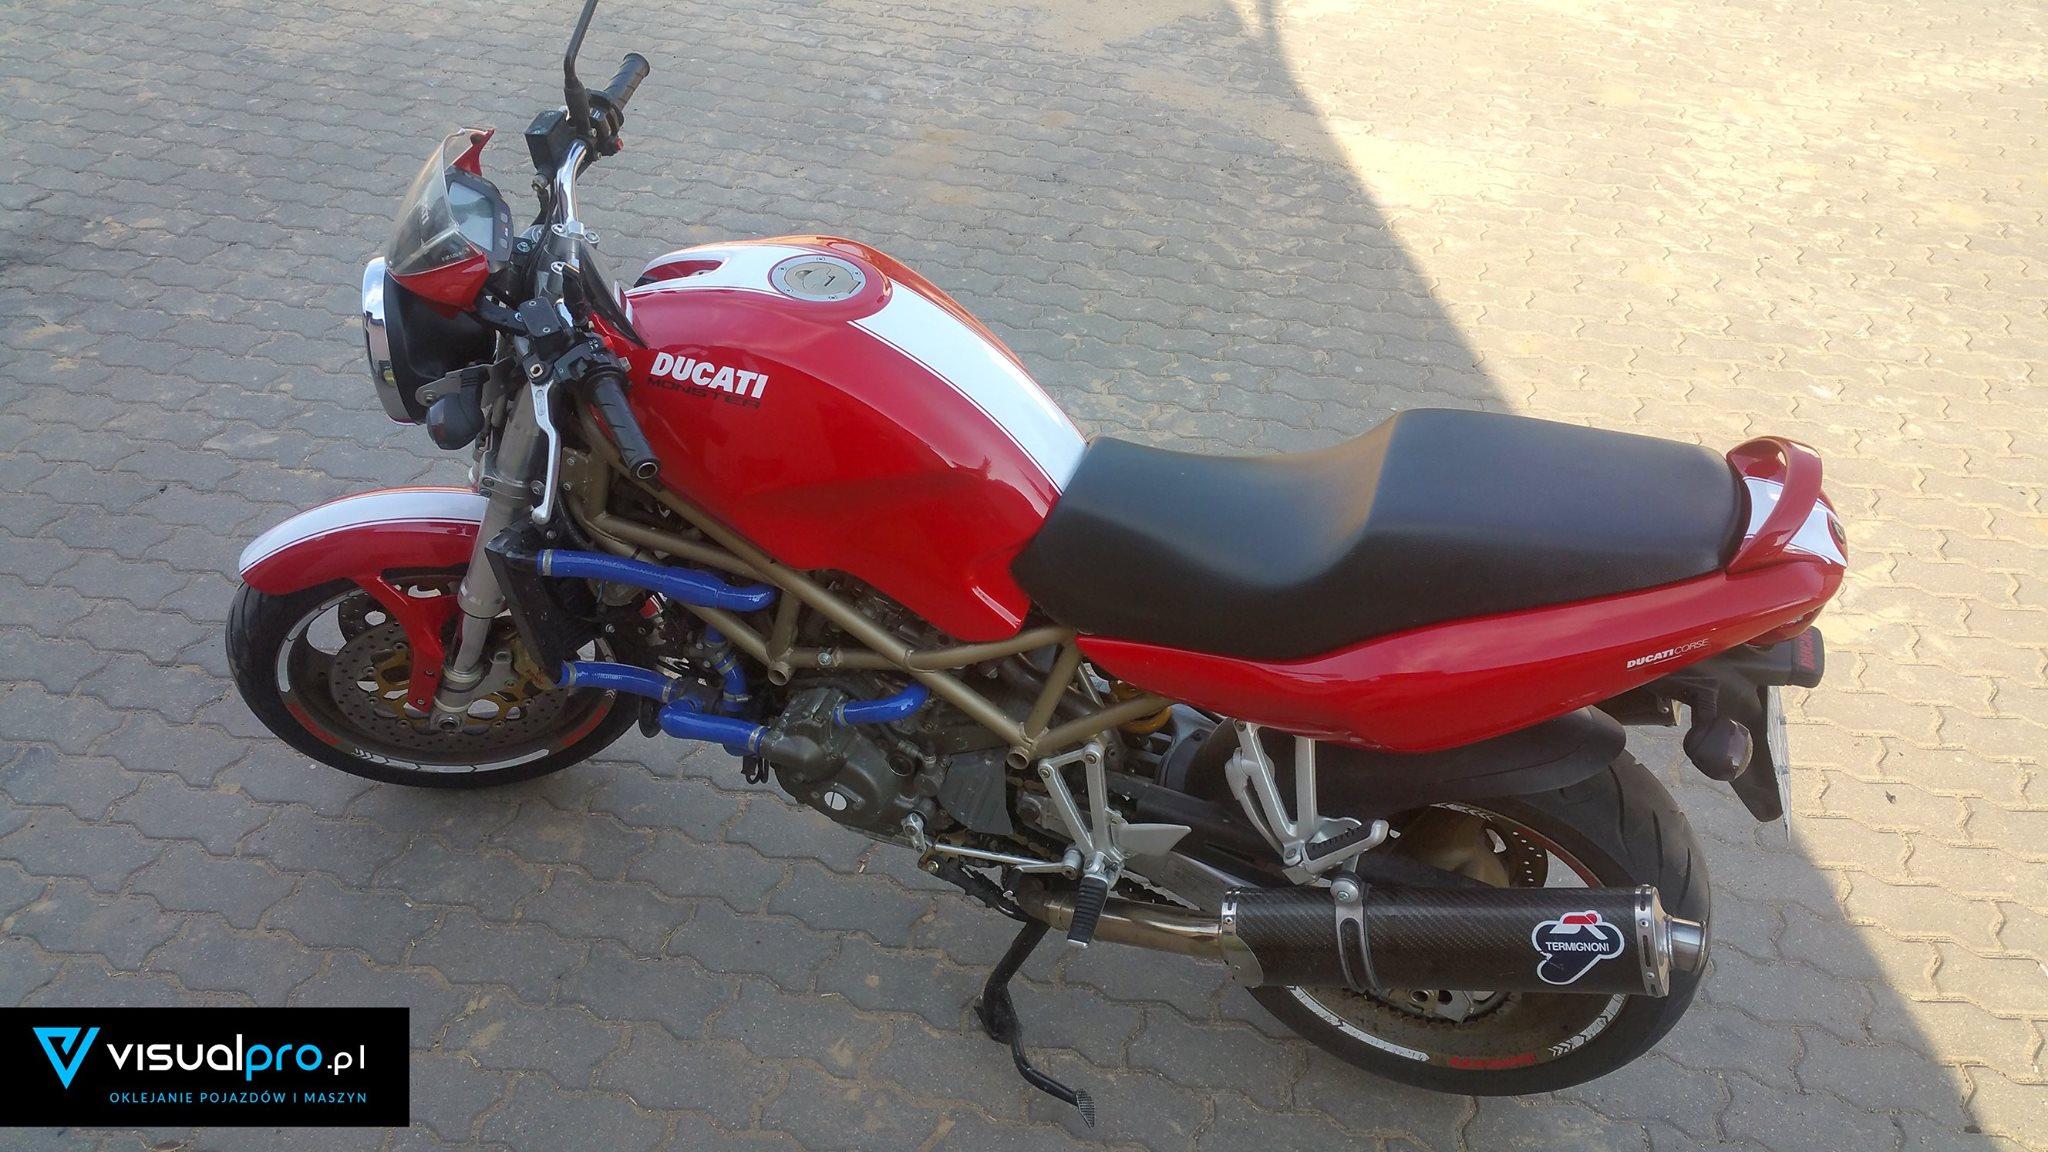 Odnowienie Naklejek Ducati